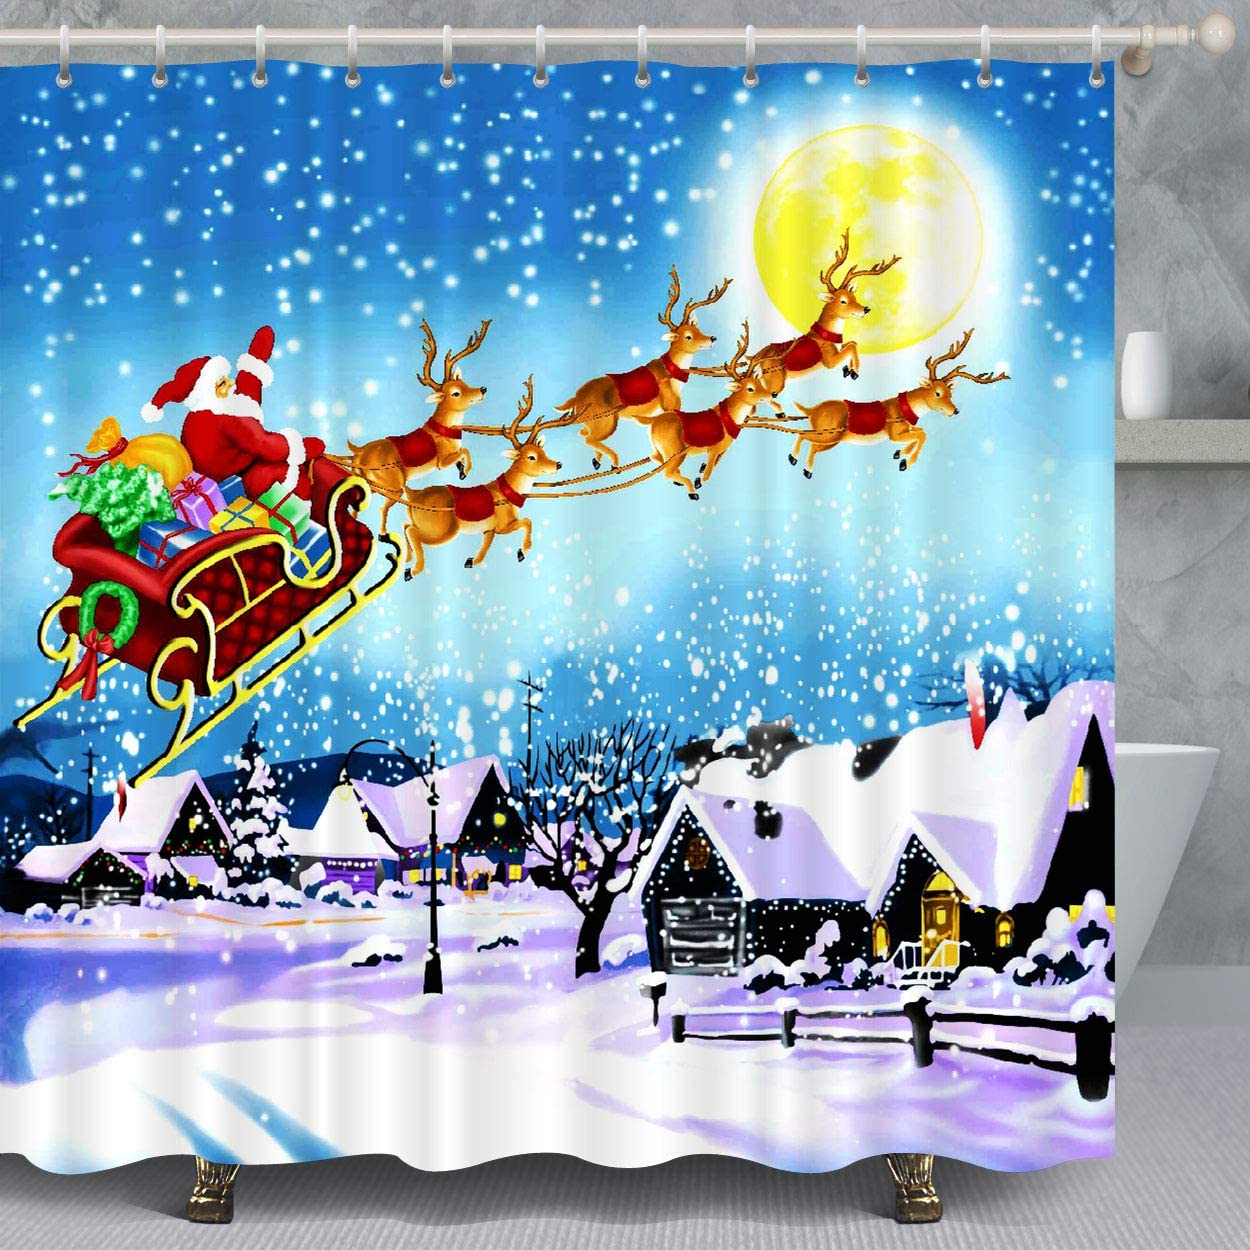 VANCAR Xmas Merry Christmas Shower Curtain Santa Claus Reindeer Sled Gifts Christmas Party Decoration Shower Curtain for Bathroom Decoration Home Decor 72